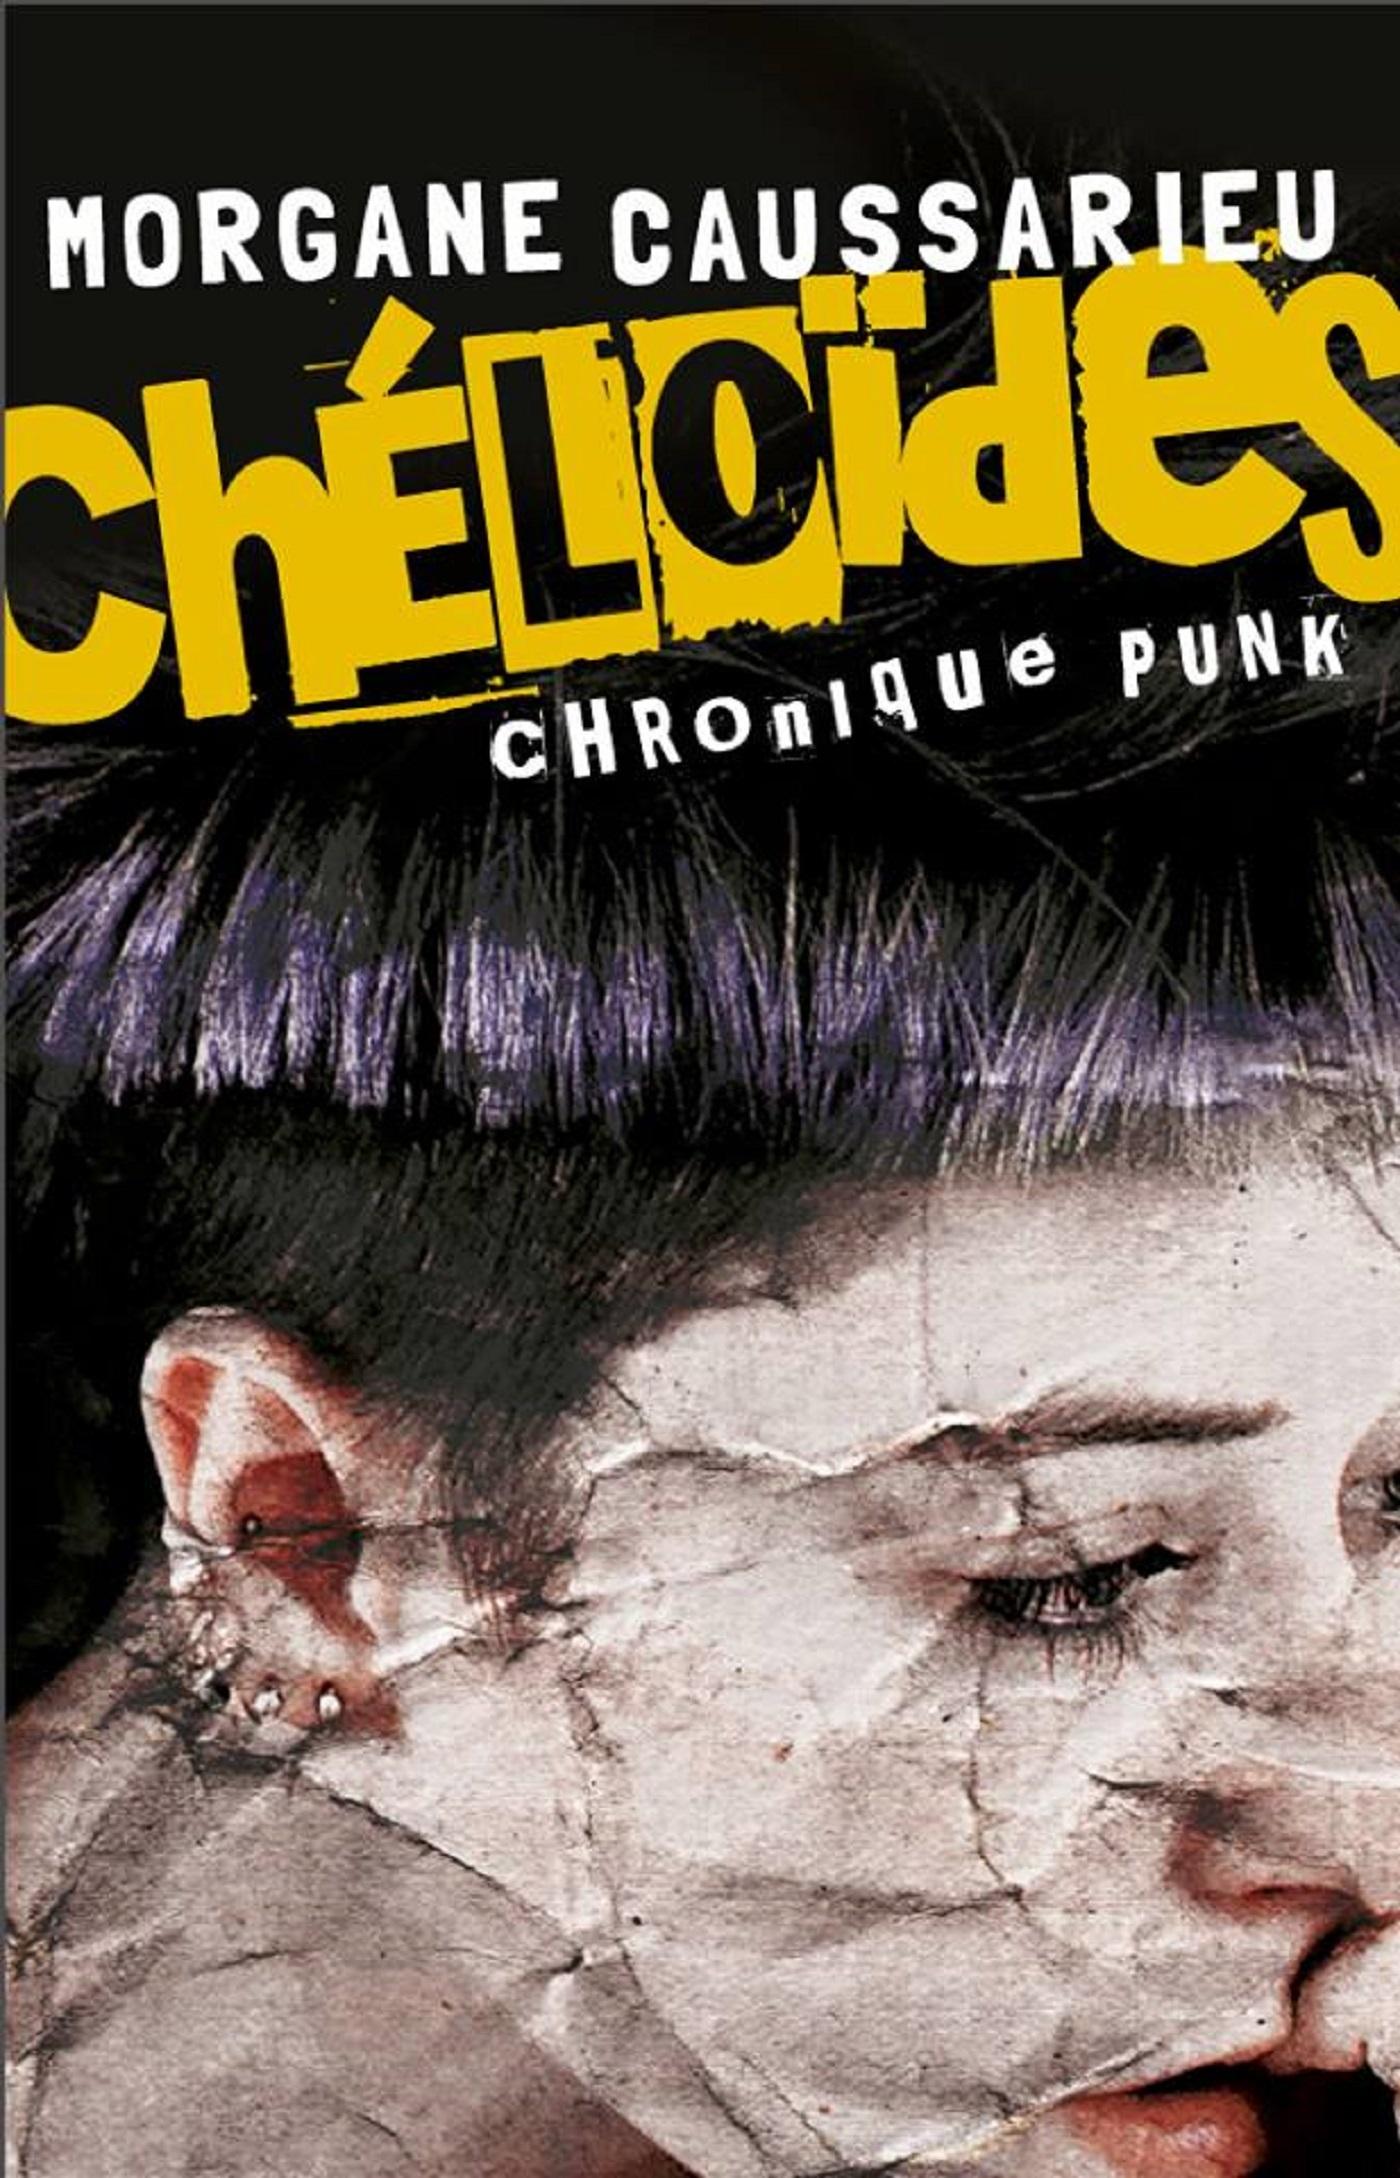 CHELOIDES CHRONIQUES PUNKS